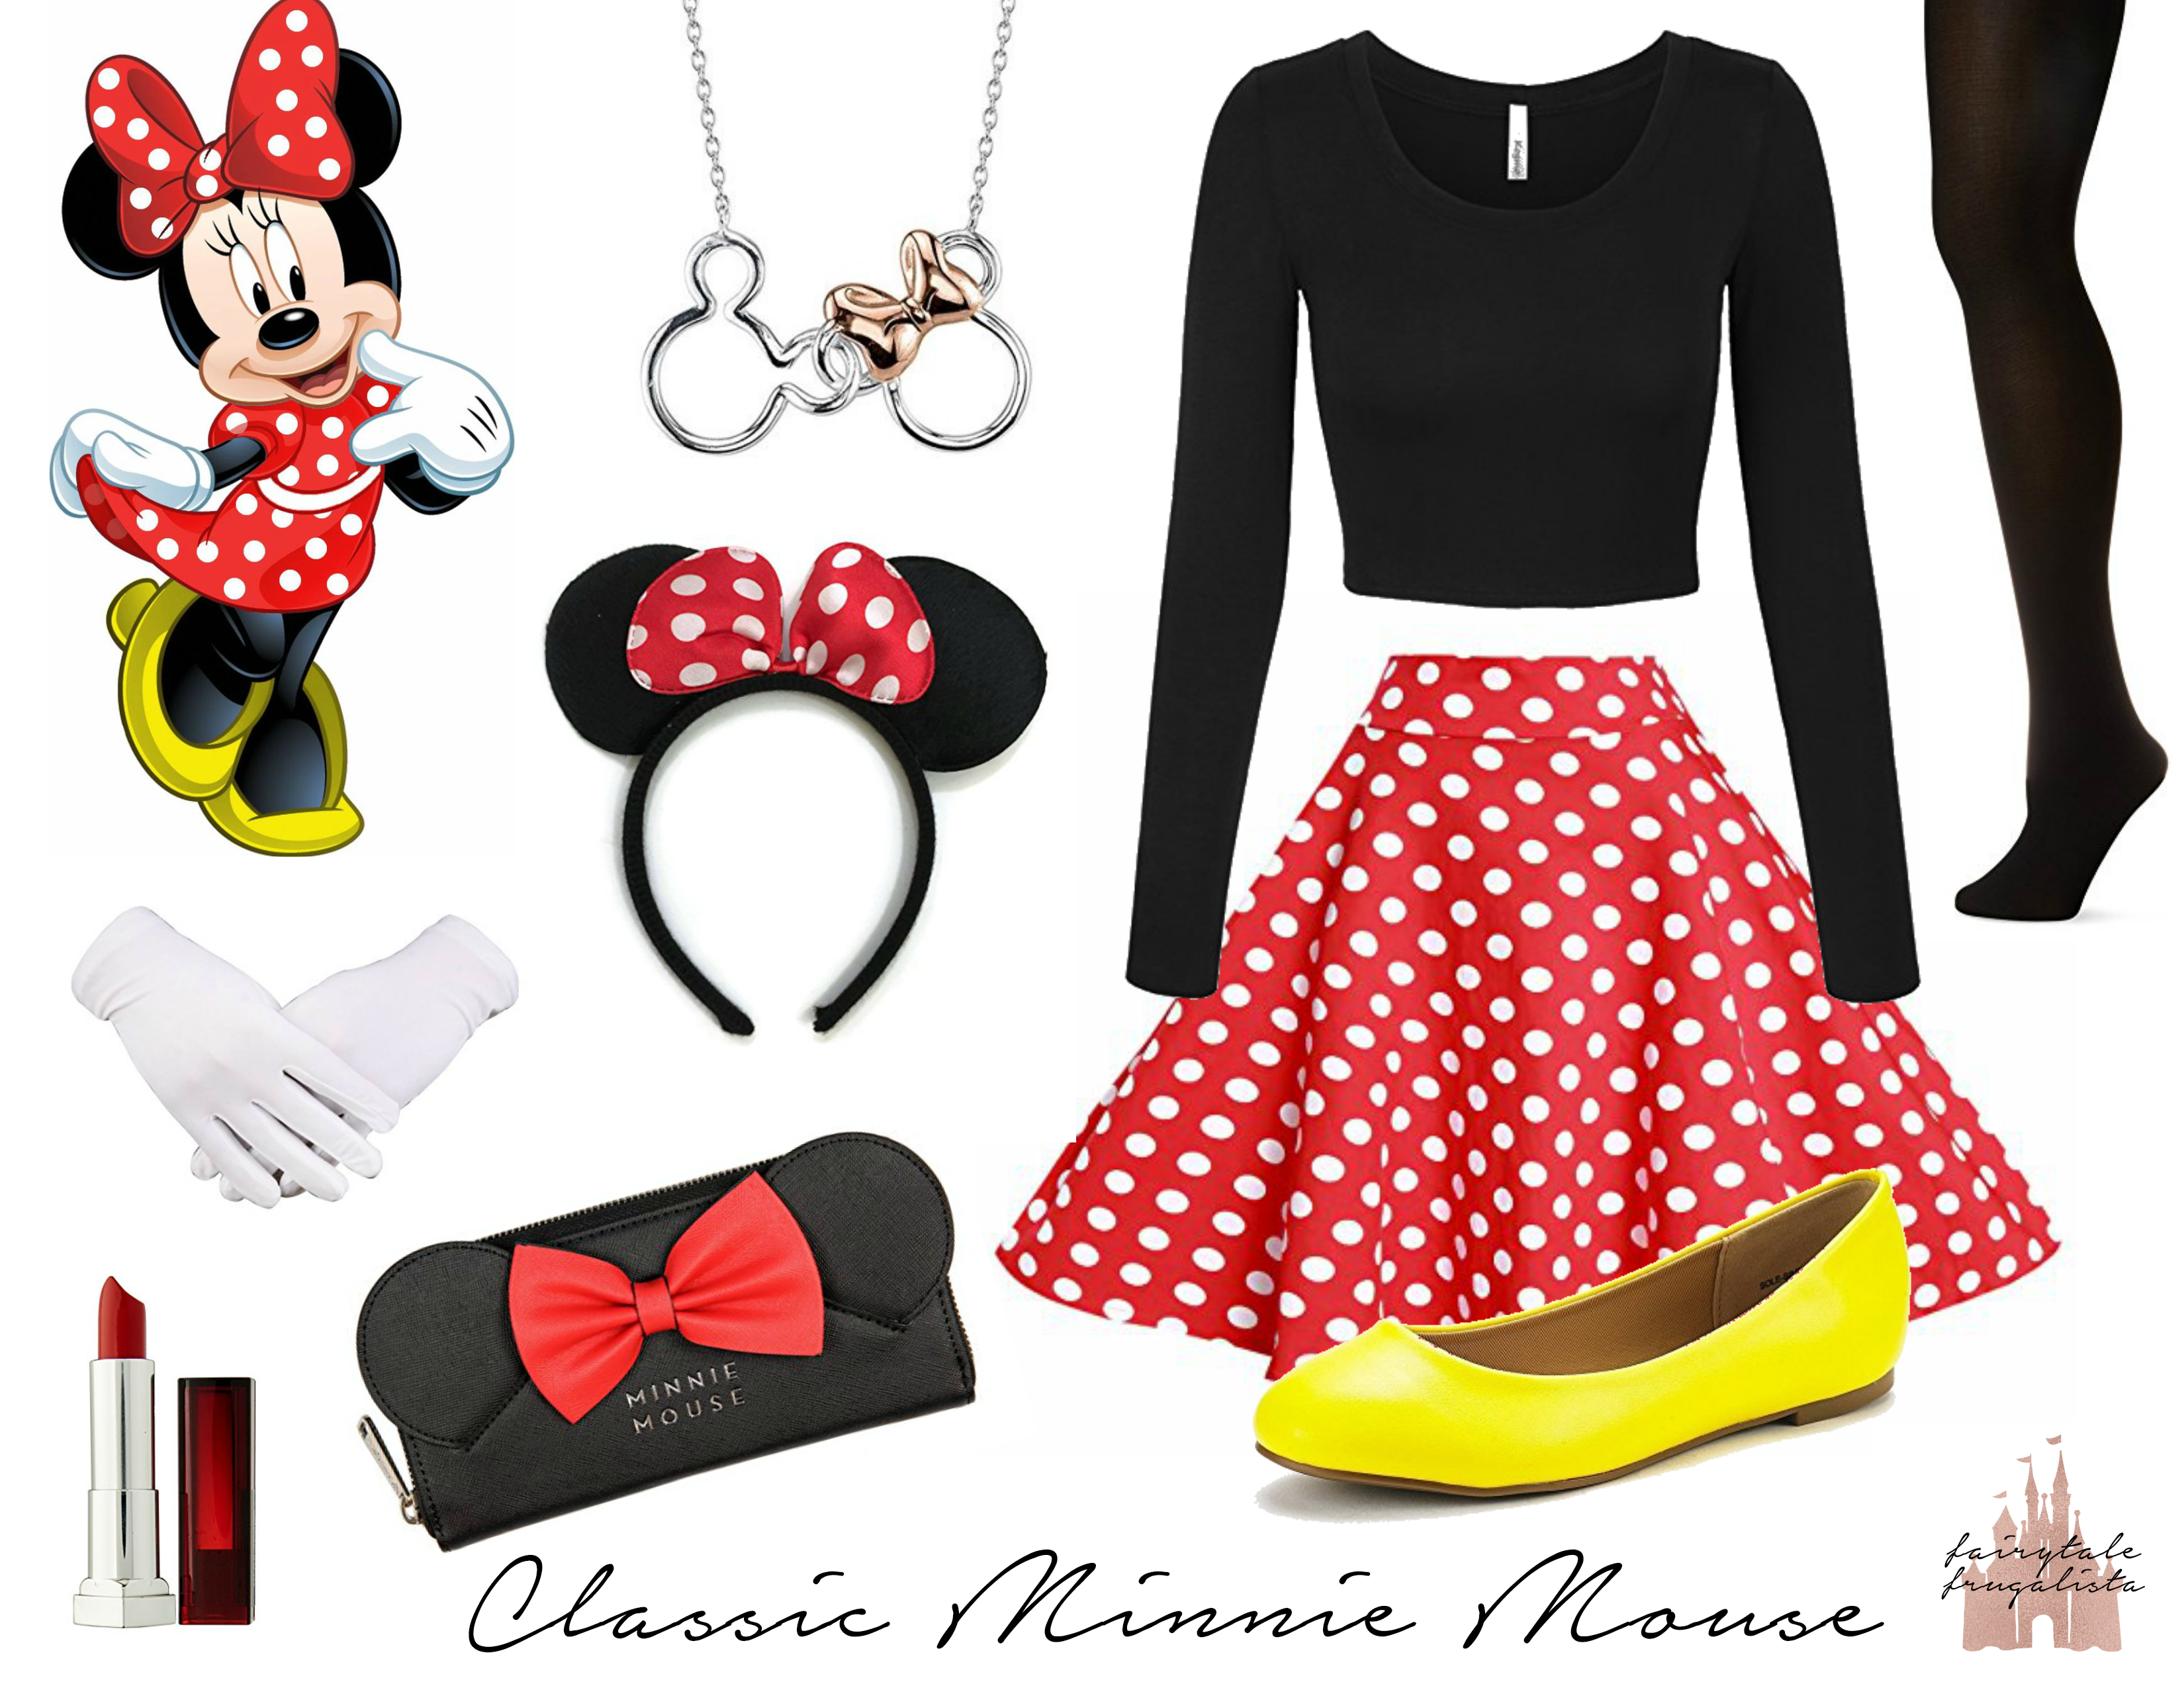 9a051f53f6 Disneybounding: Classic Minnie Mouse in 2019   Disney Fashion ღ ...